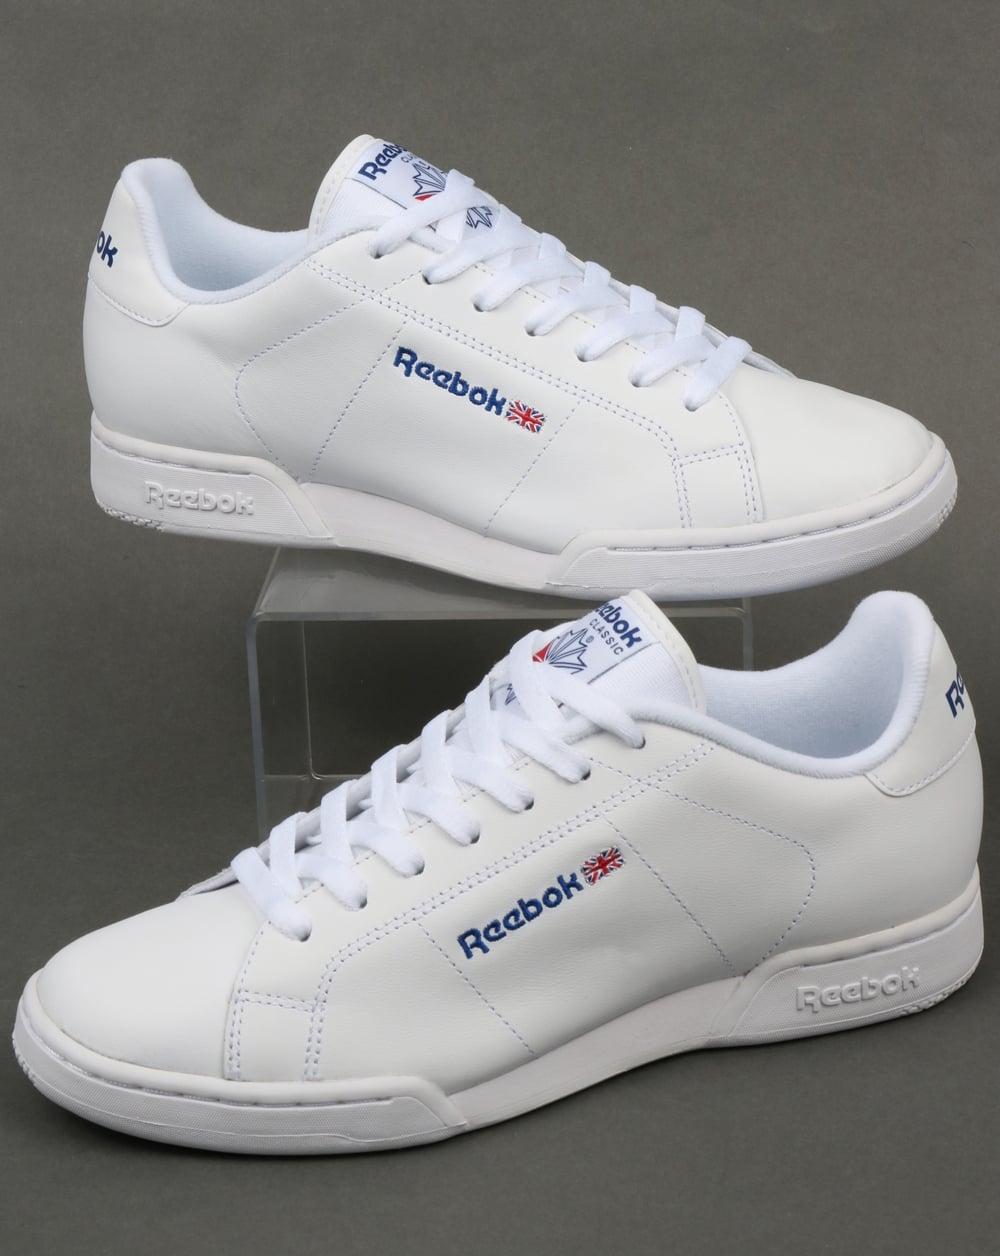 venta directa de fábrica nueva colección detalles para Reebok NPC II Trainers White/White